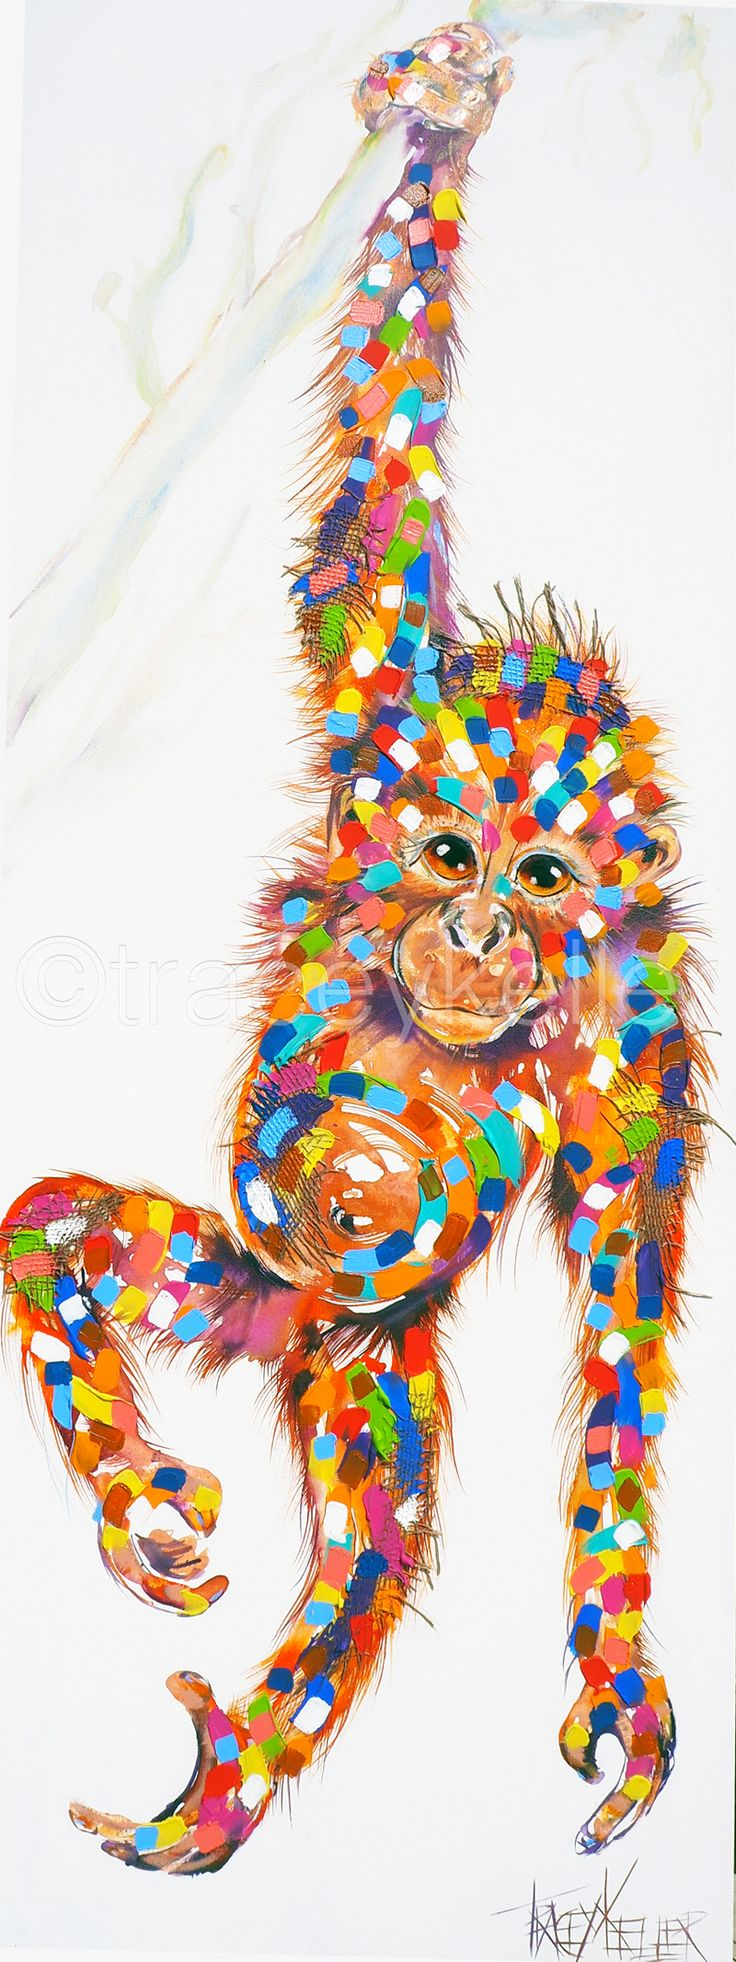 Judith's Ape monkey painting tracey keller